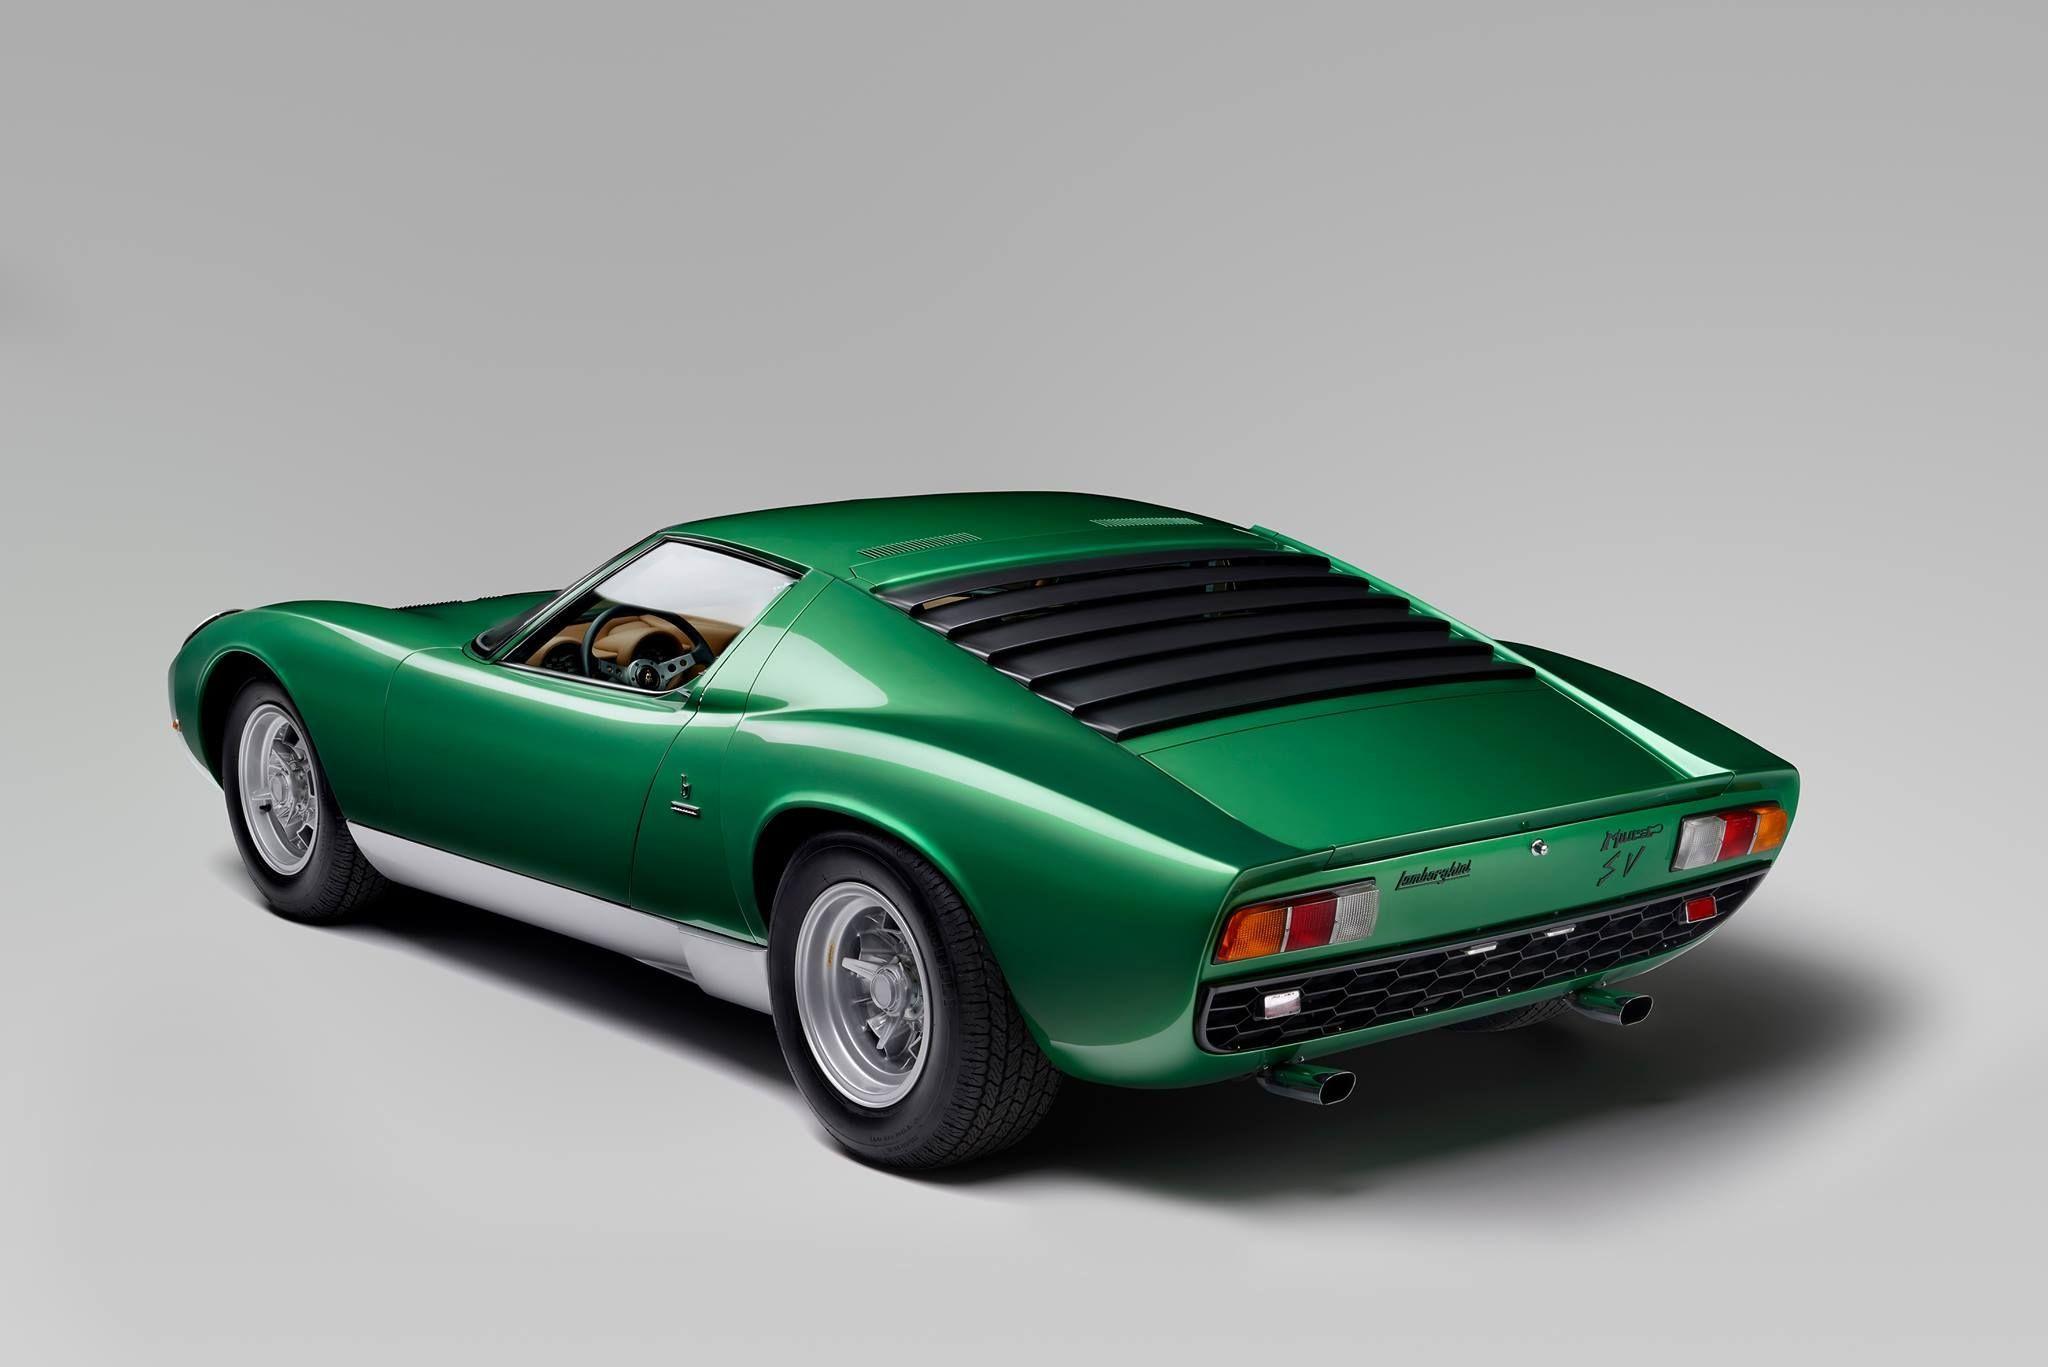 Bespoke Lamborghini Aventador Sv Pays Tribute To Special Miura